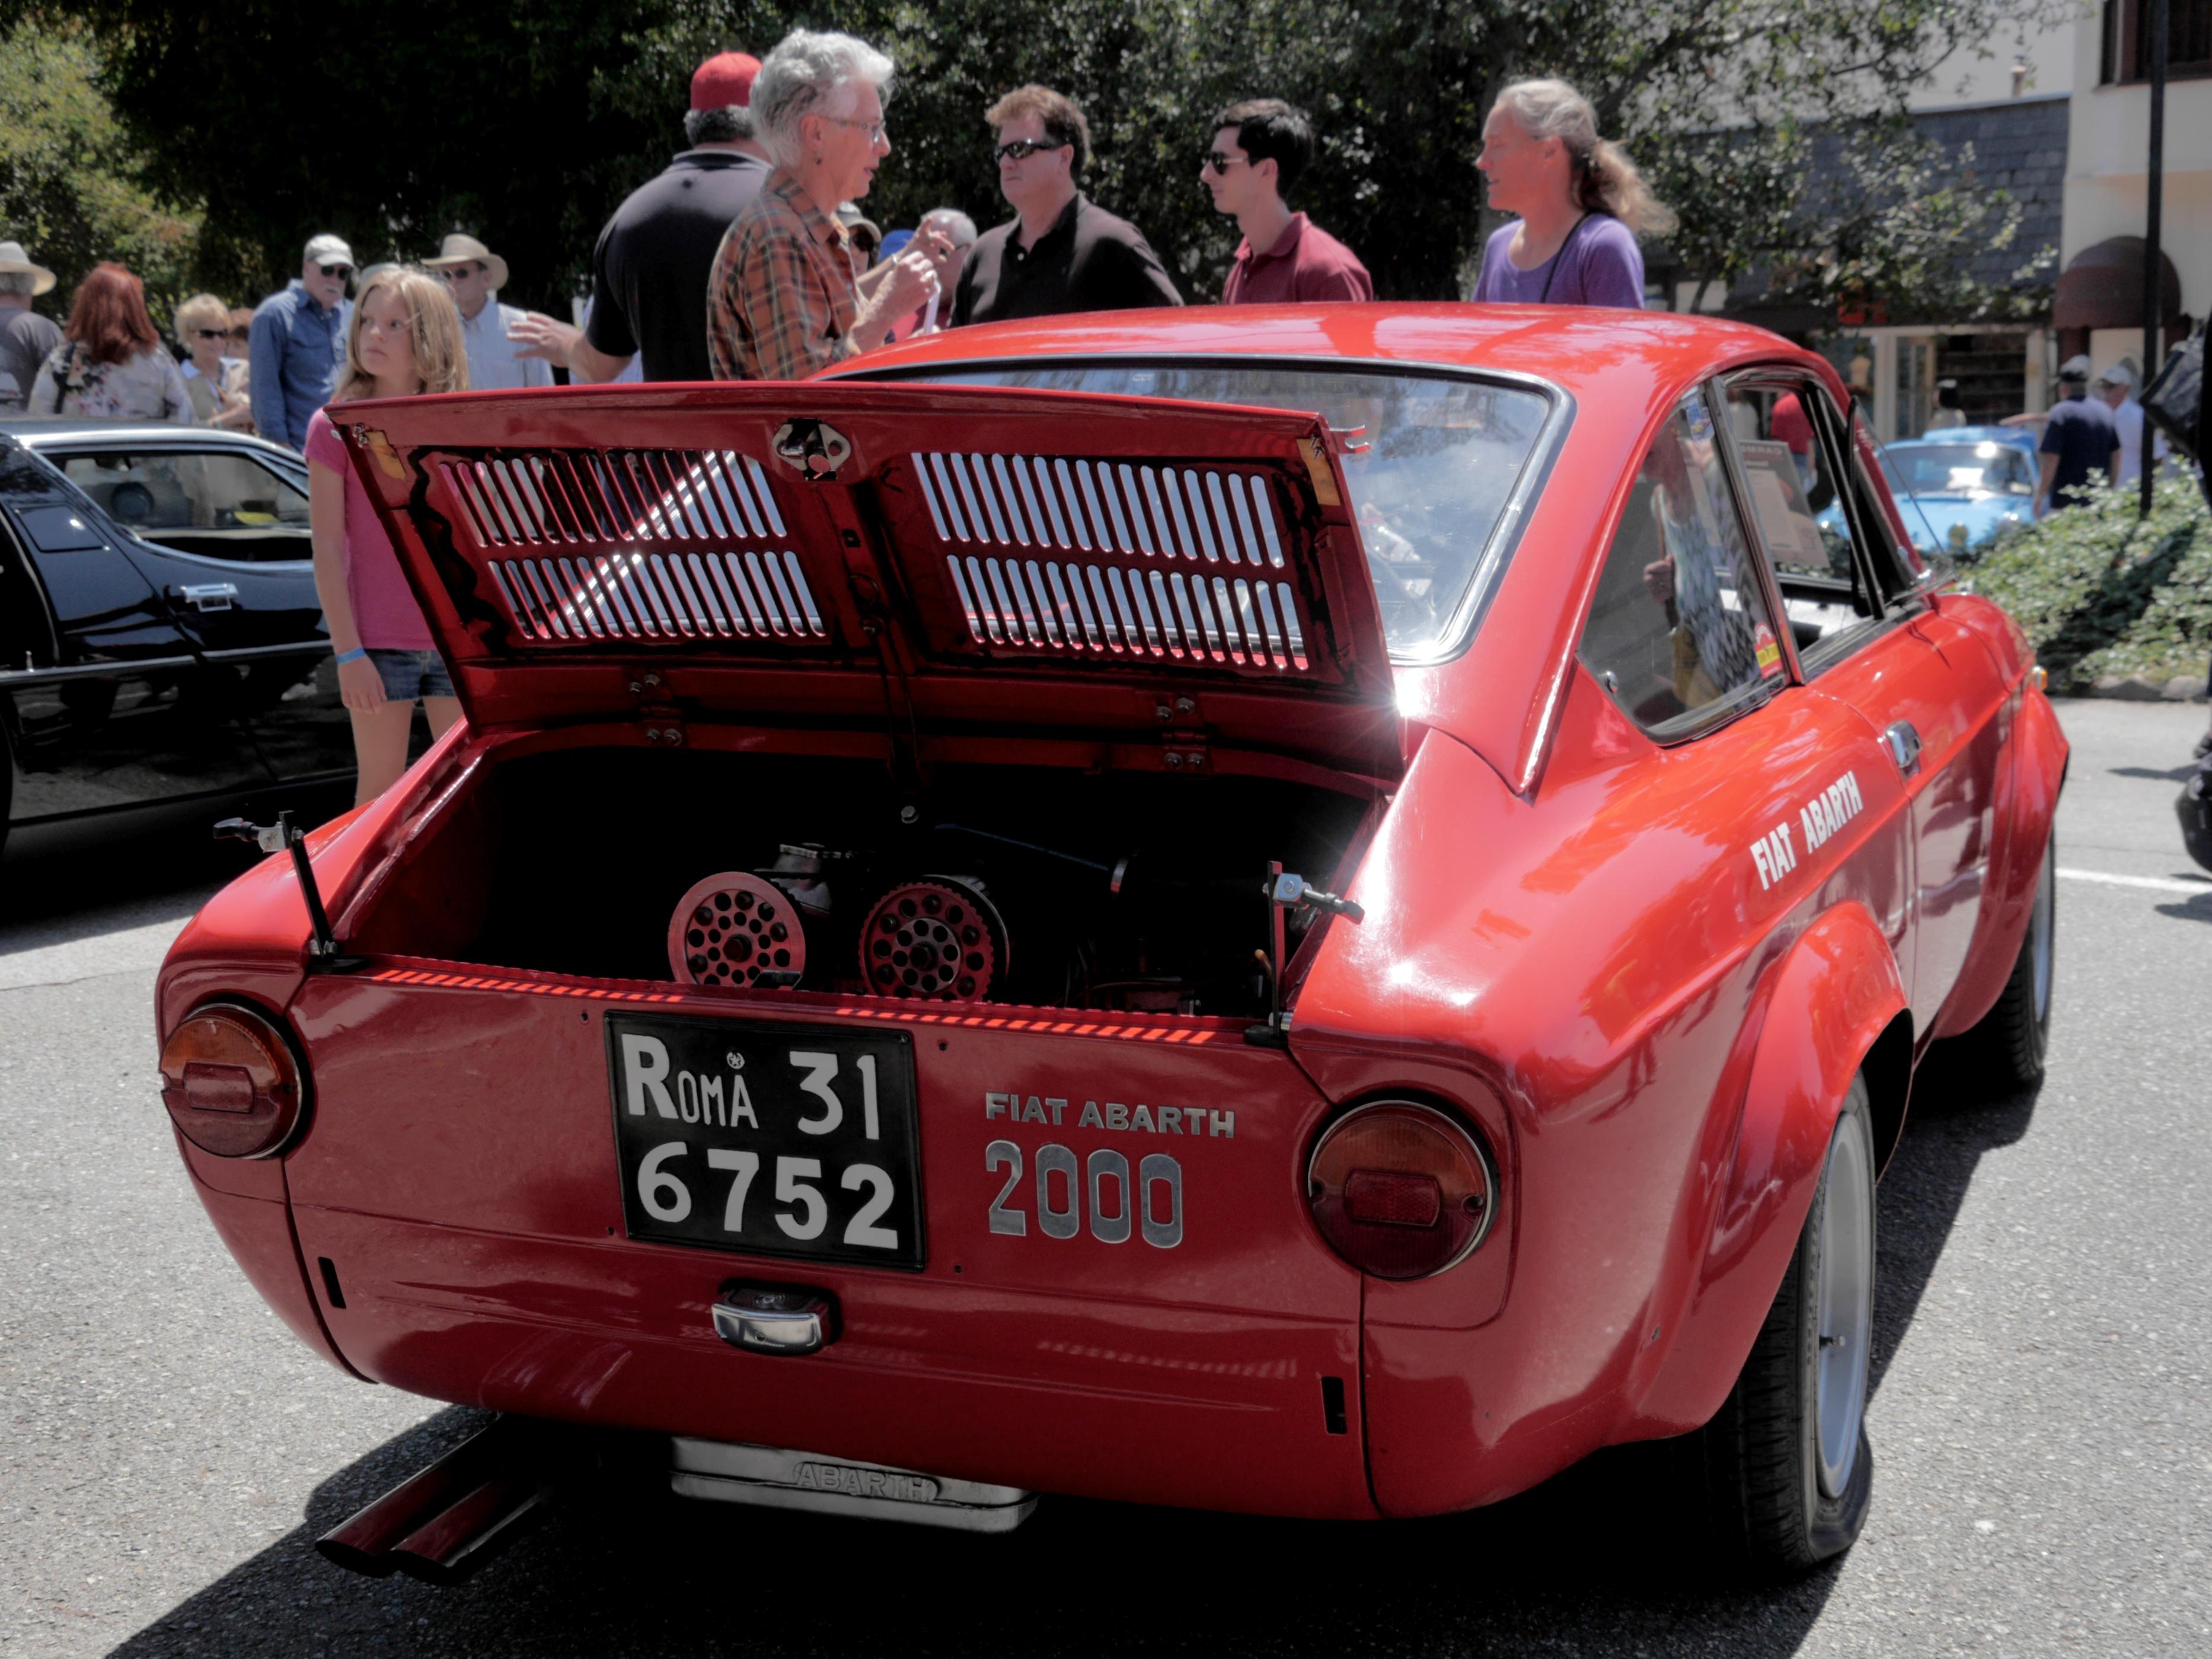 Fiat abarth ot 2000